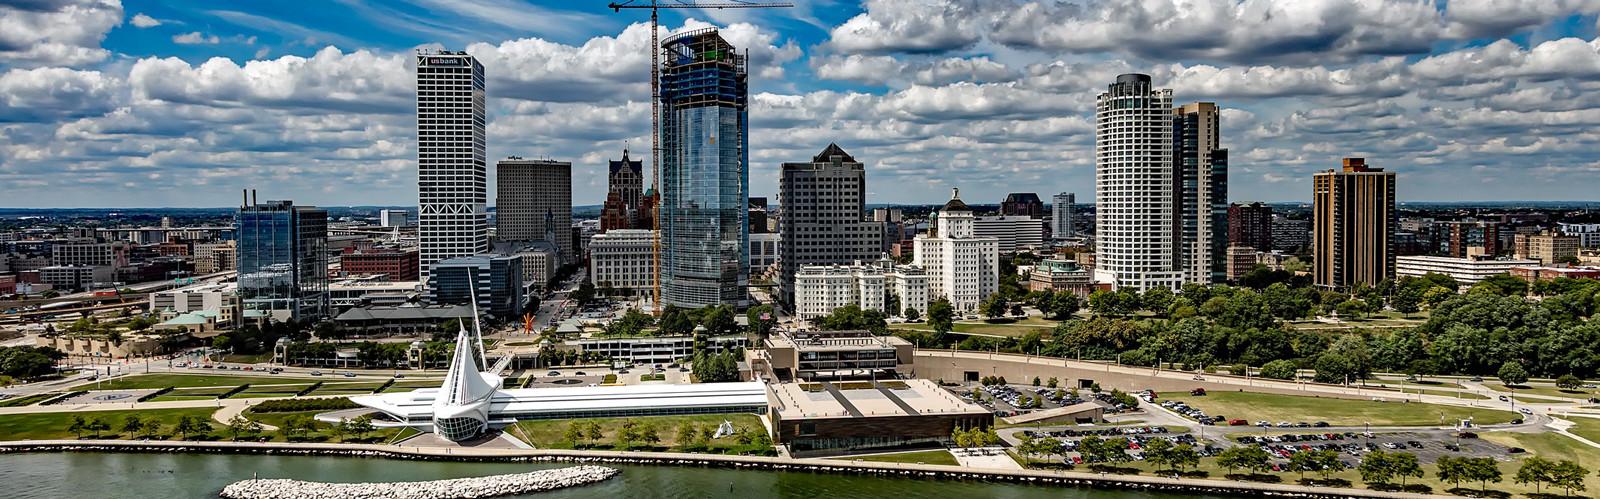 RegisHighSchool-PrivateDay-USA-Wisconsin-CityOverview